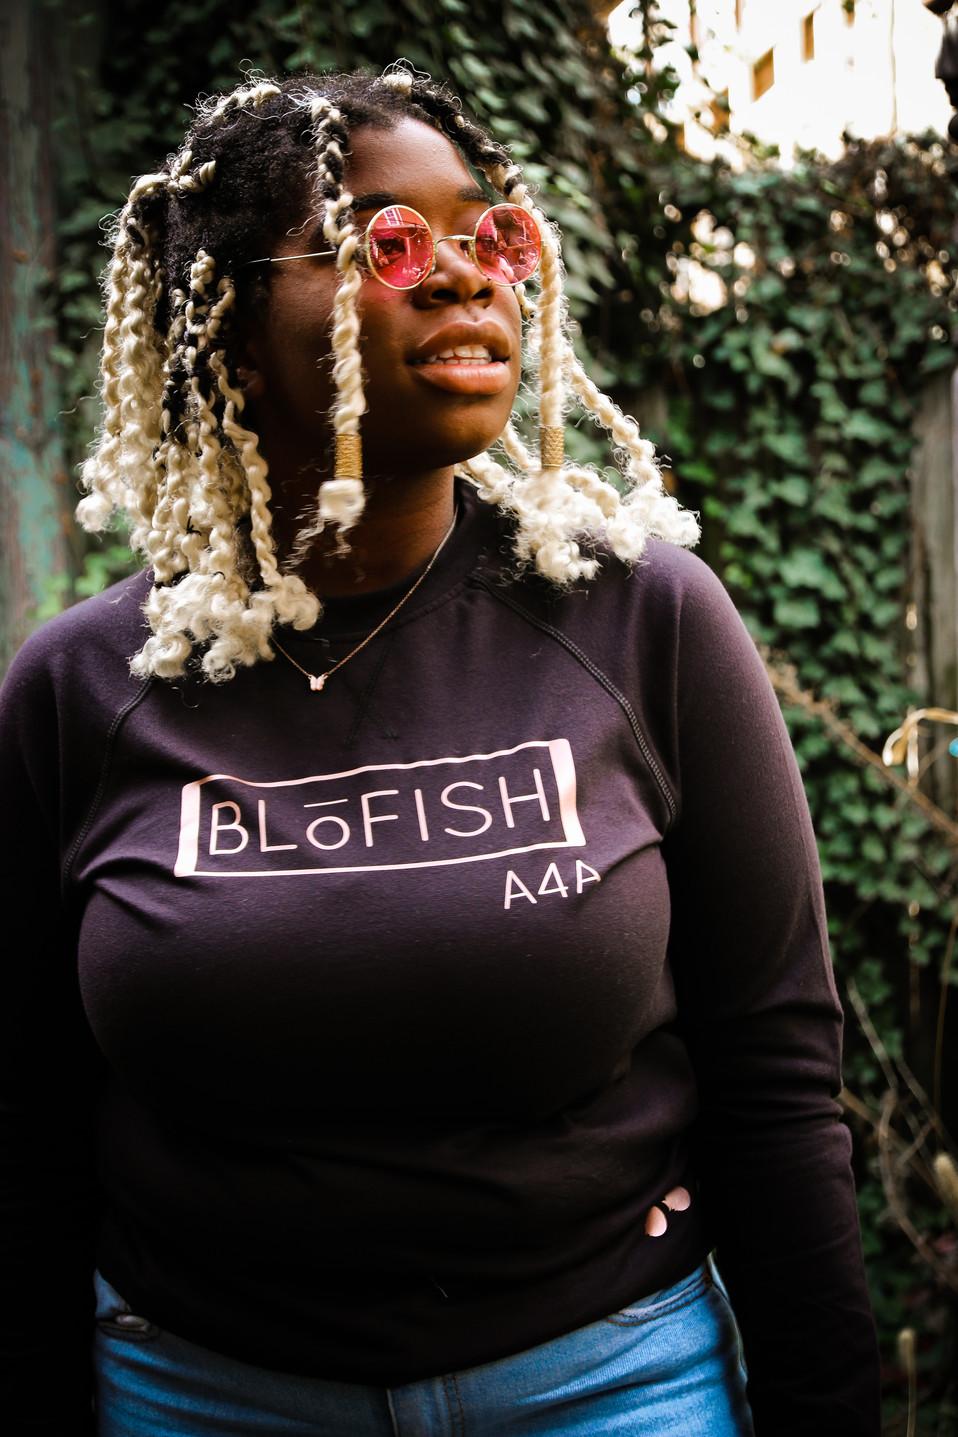 Blofish_logo_Pink-5.jpg